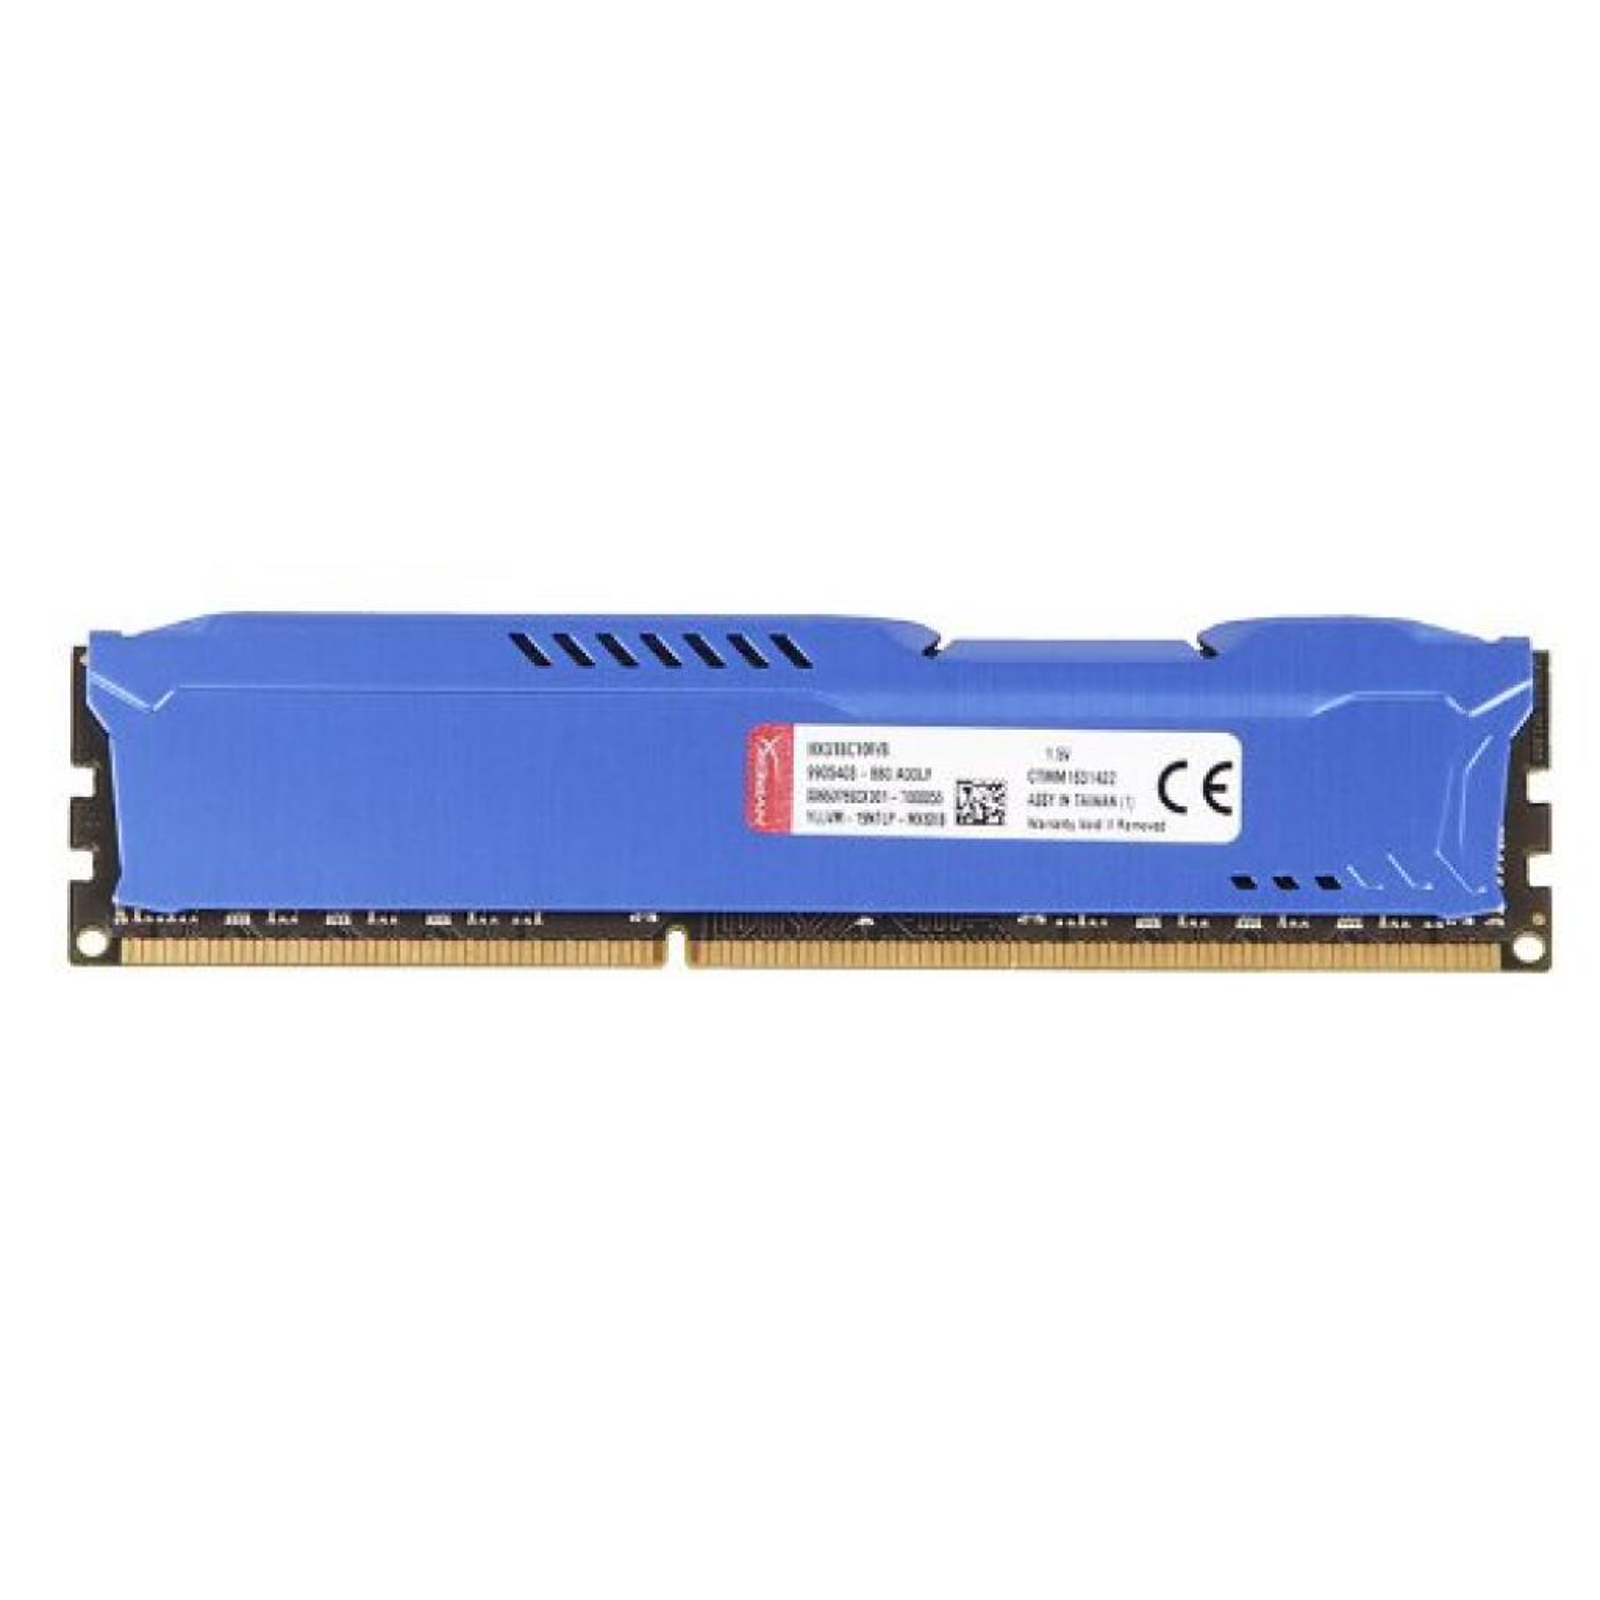 Модуль памяти для компьютера DDR3 8Gb 1600 MHz HyperX Fury Blu Kingston (HX316C10F/8) изображение 3